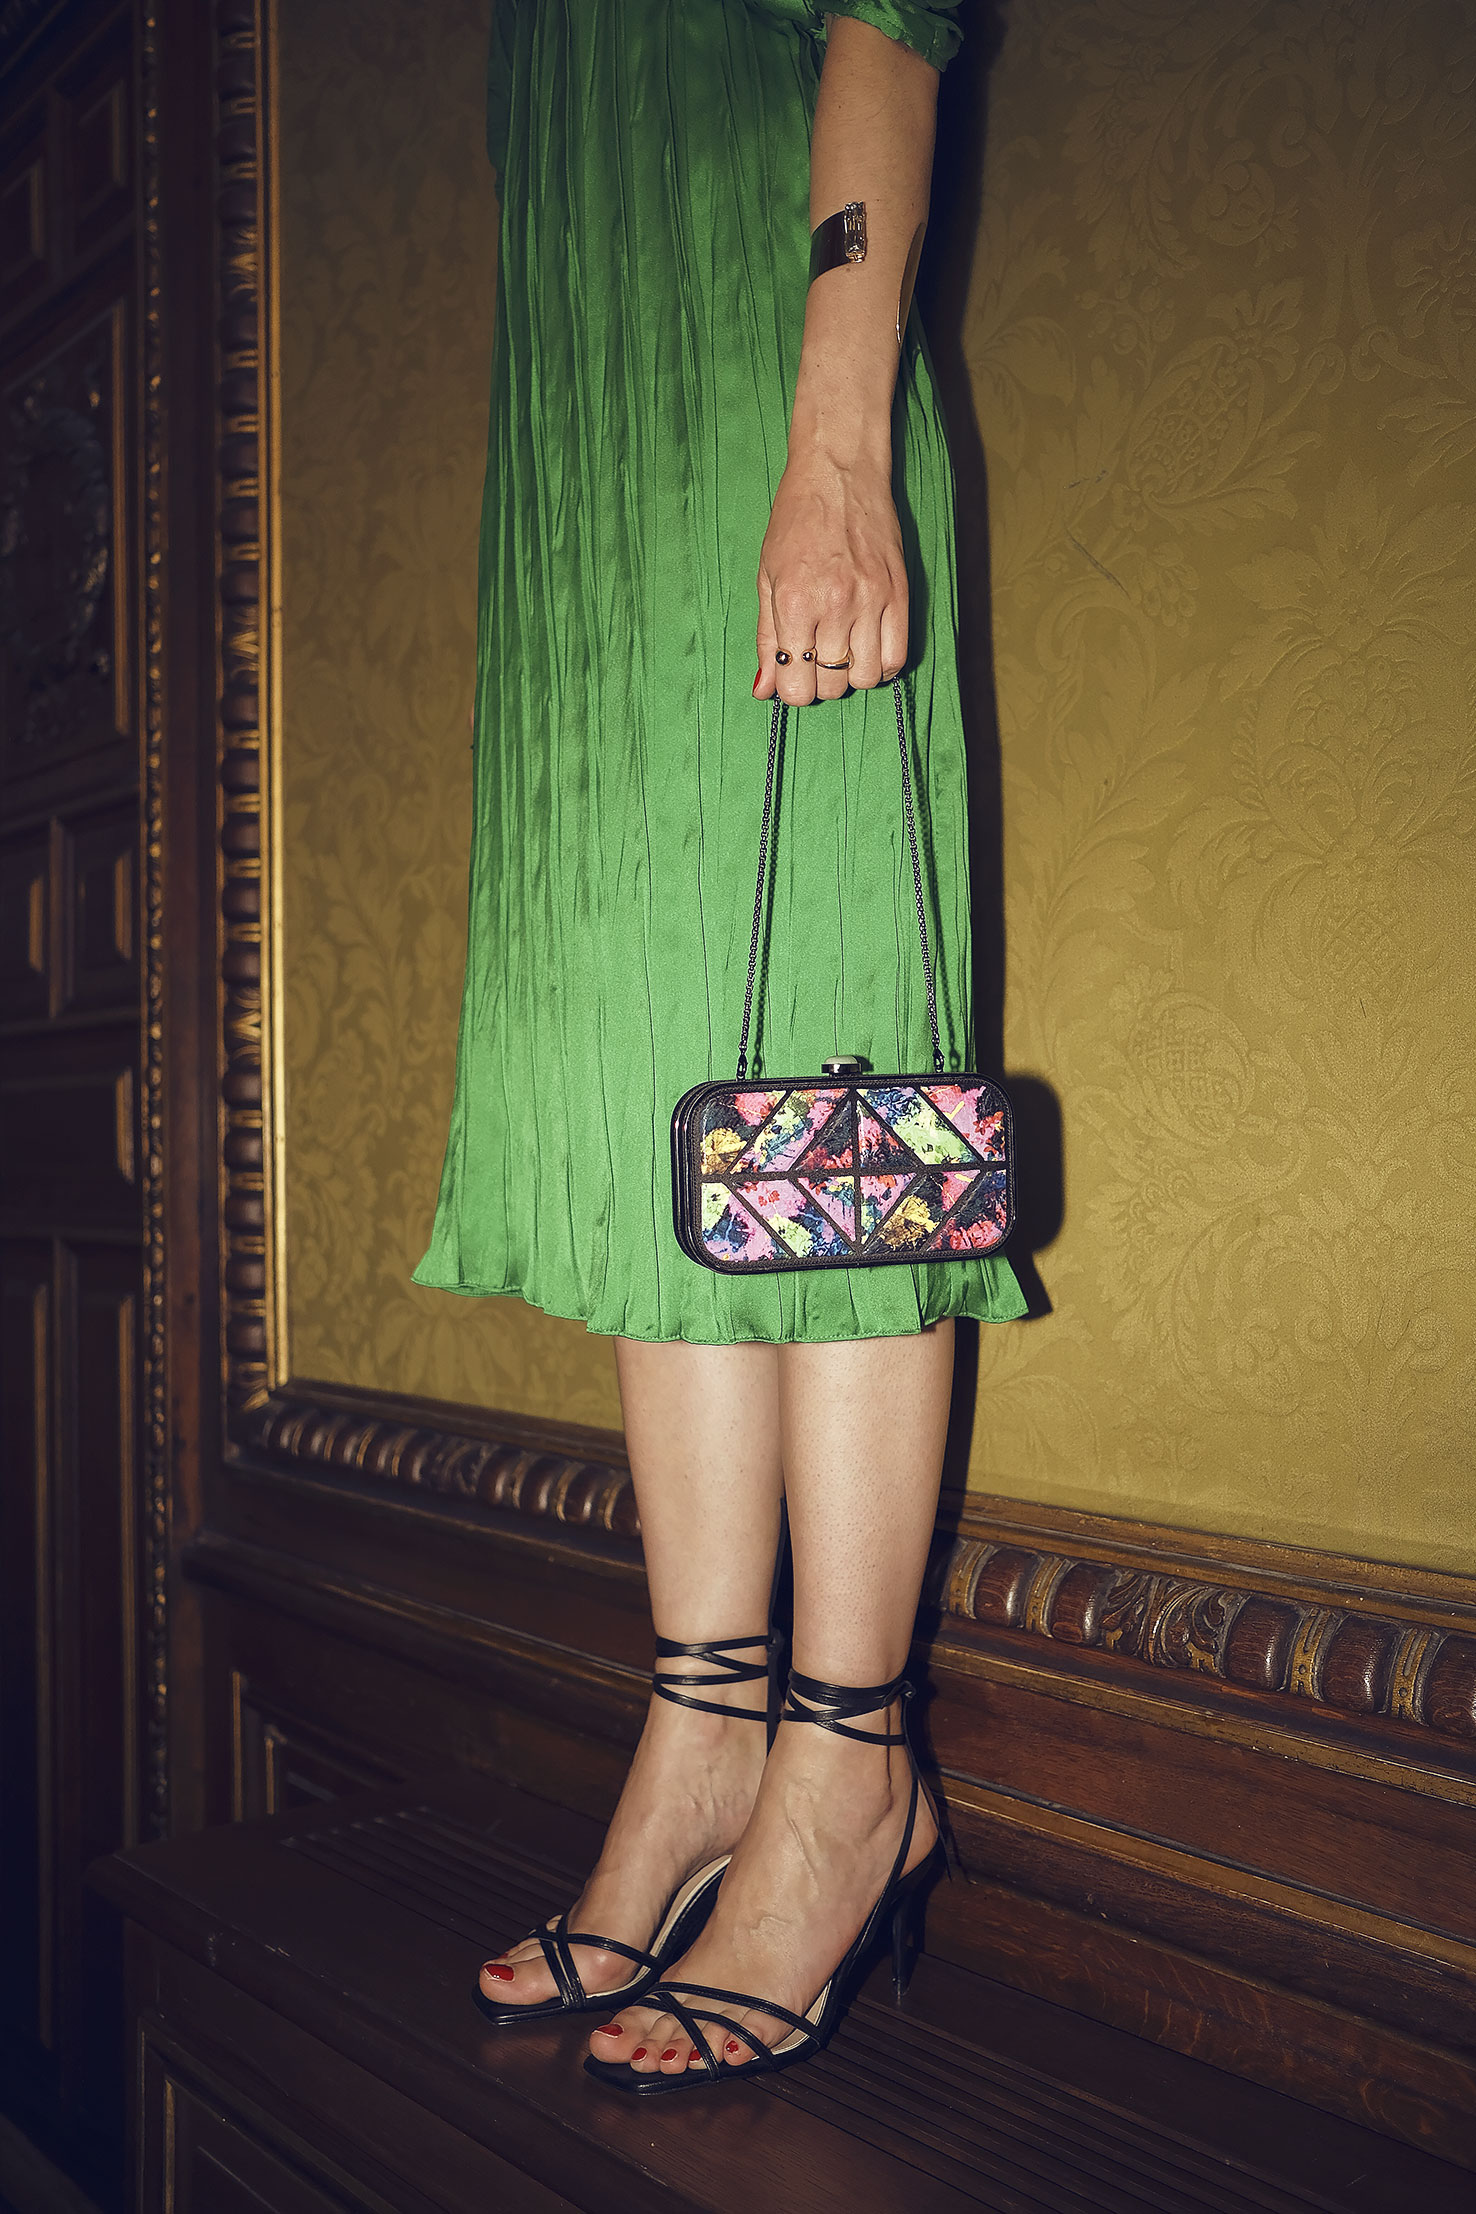 pellegrino sac paris campagne photographie photo modele lucie mahé